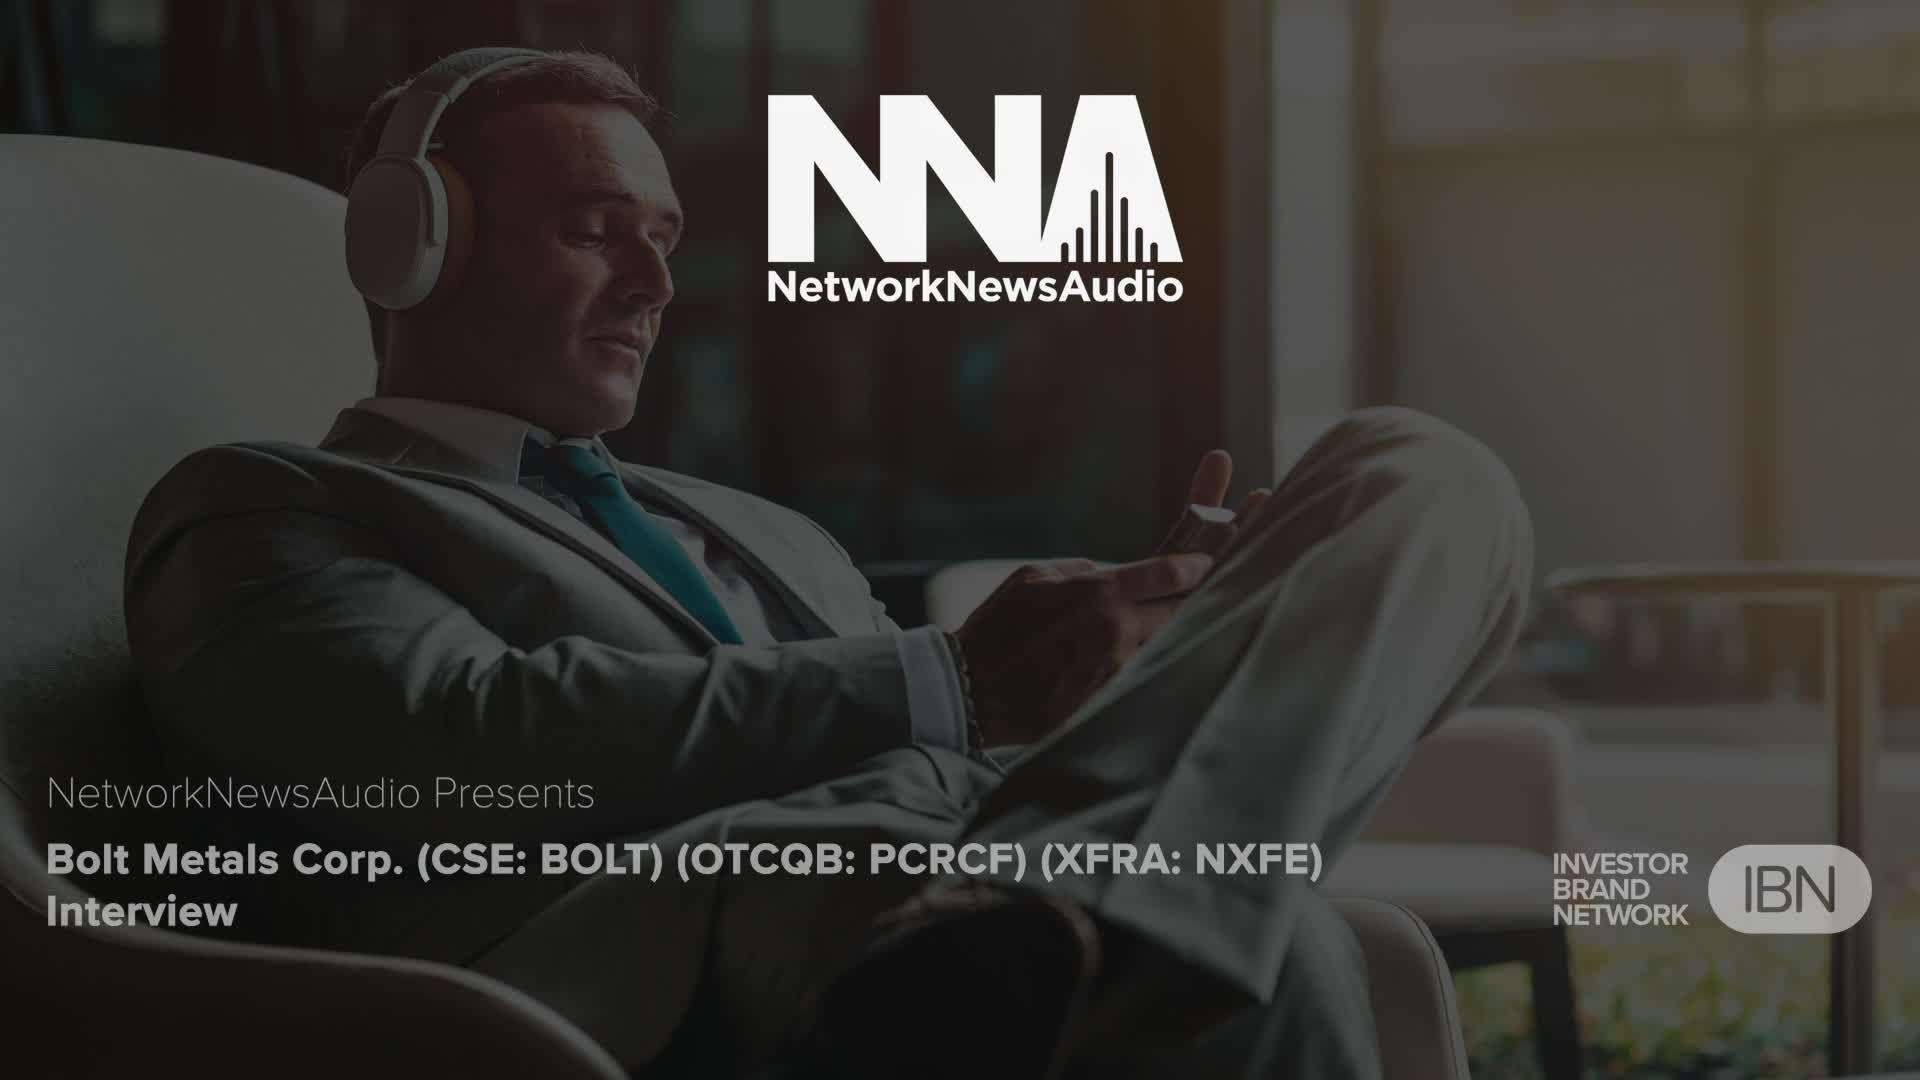 Bolt Metals Corp. (CSE: BOLT) (OTCQB: PCRCF) (XFRA: NXFE) Interview